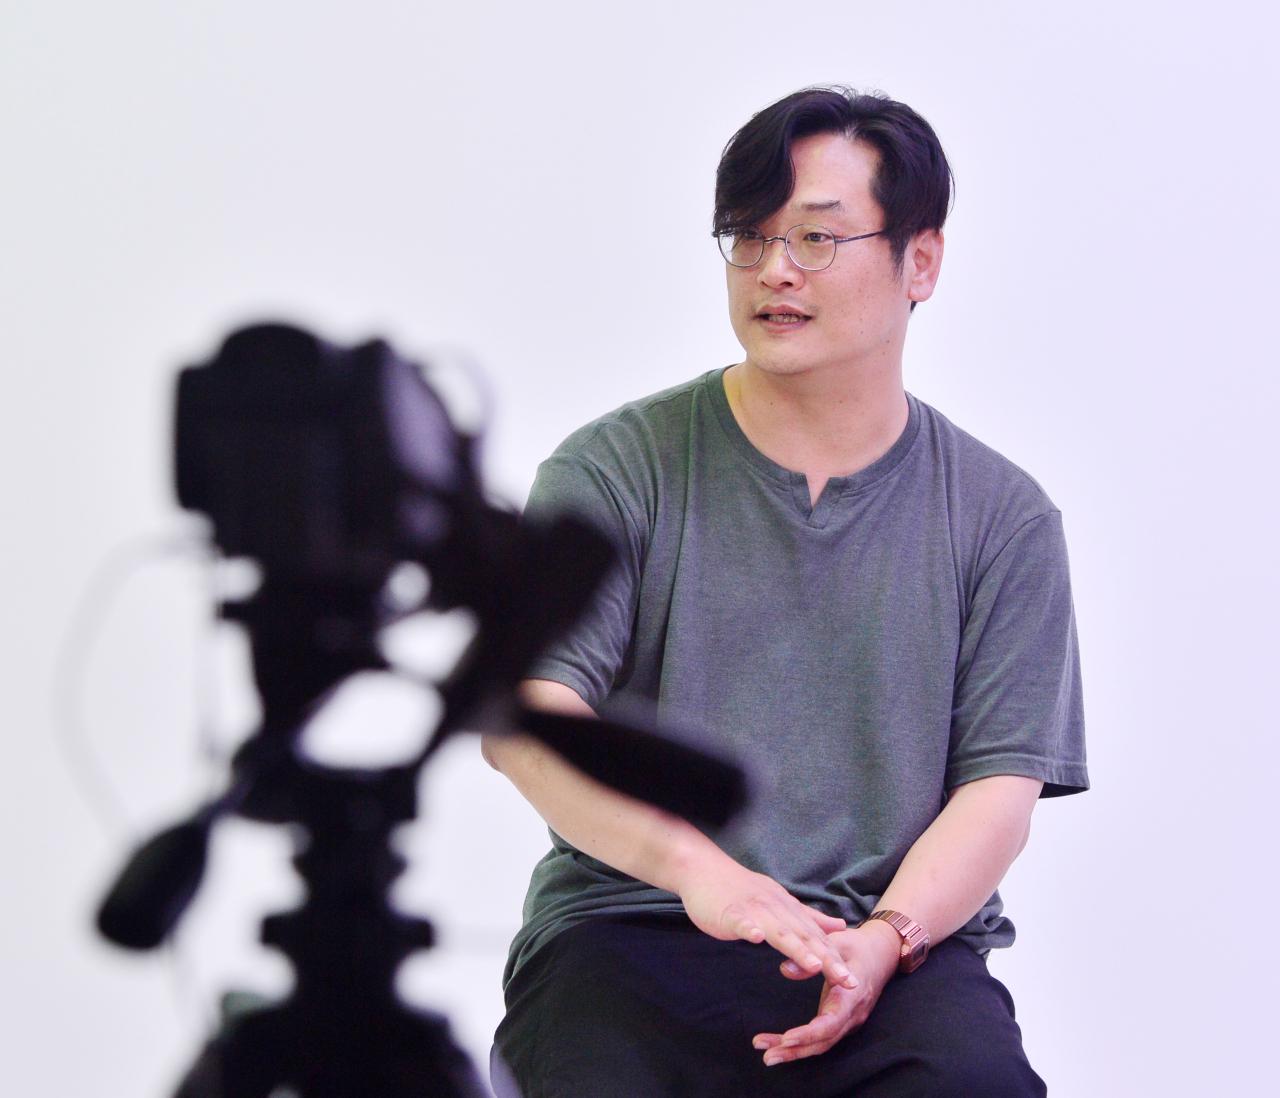 Pop music critic Cha Woo-jin speaks during an interview with The Korea Herald at Herald Studio on June 23. (Park Hyun-koo/ The Korea Herald)